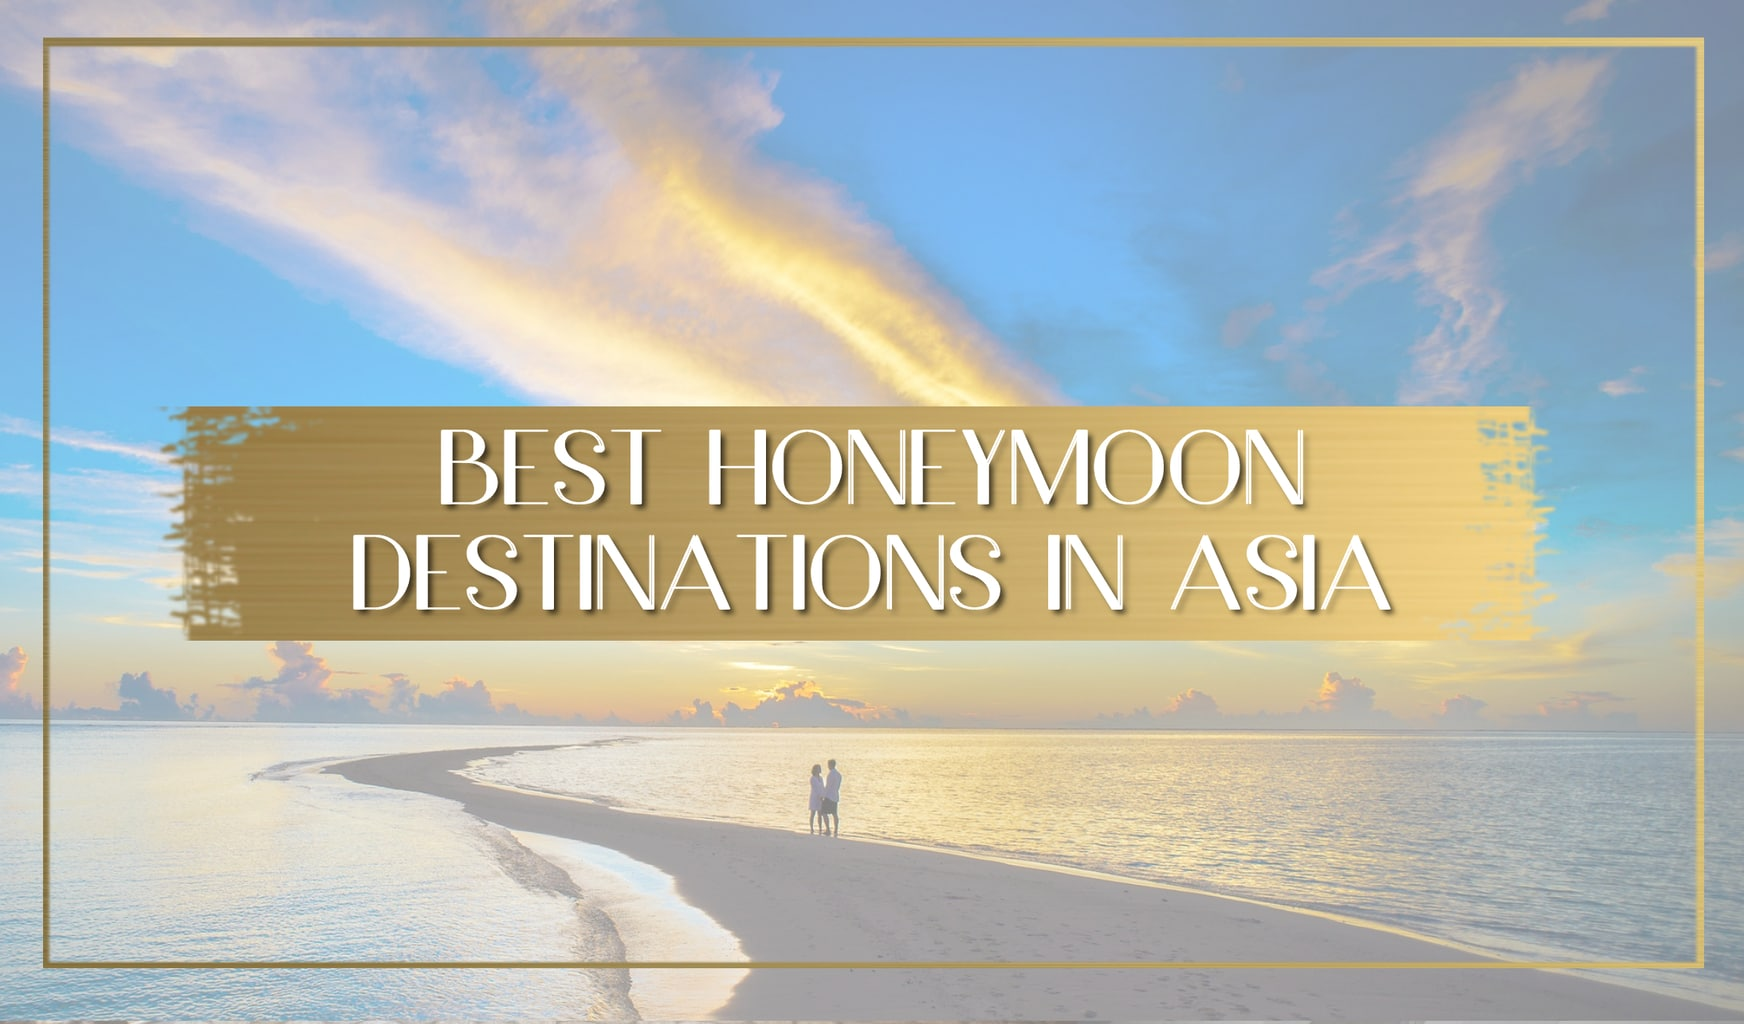 Honeymoon destinations in asia main